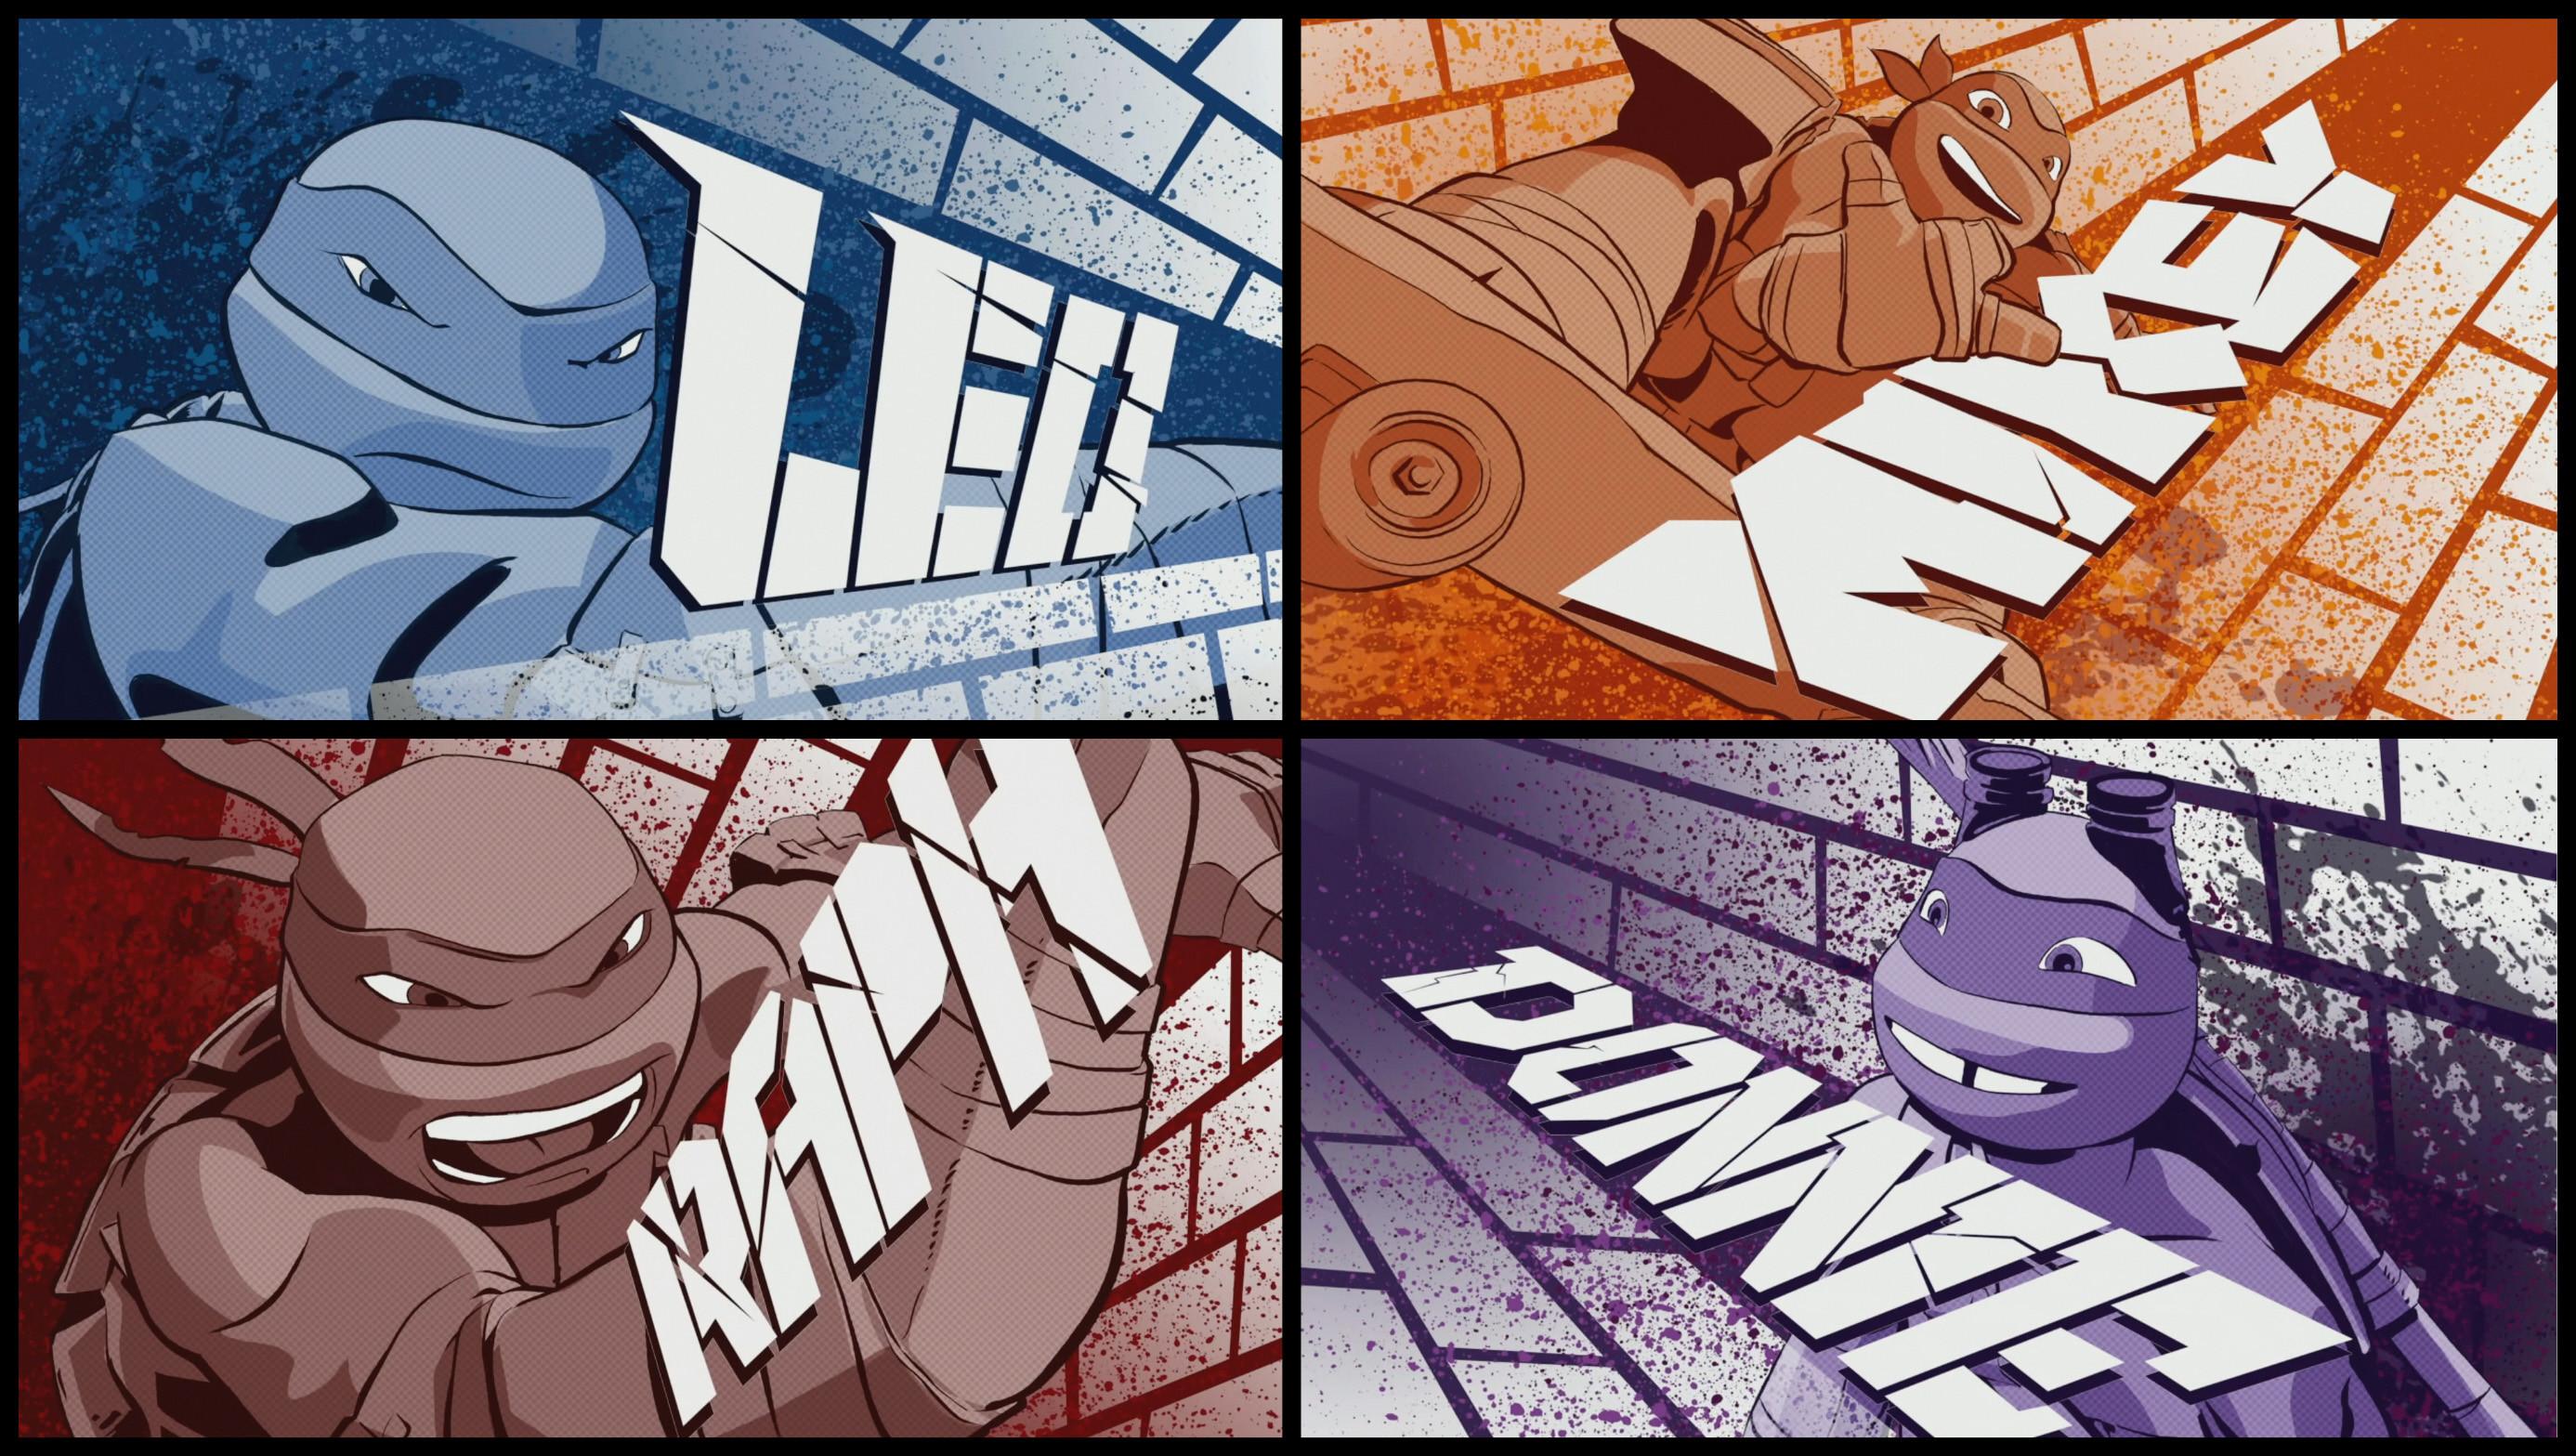 2 Teenage Mutant Ninja Turtles HD Wallpapers   Backgrounds – Wallpaper Abyss